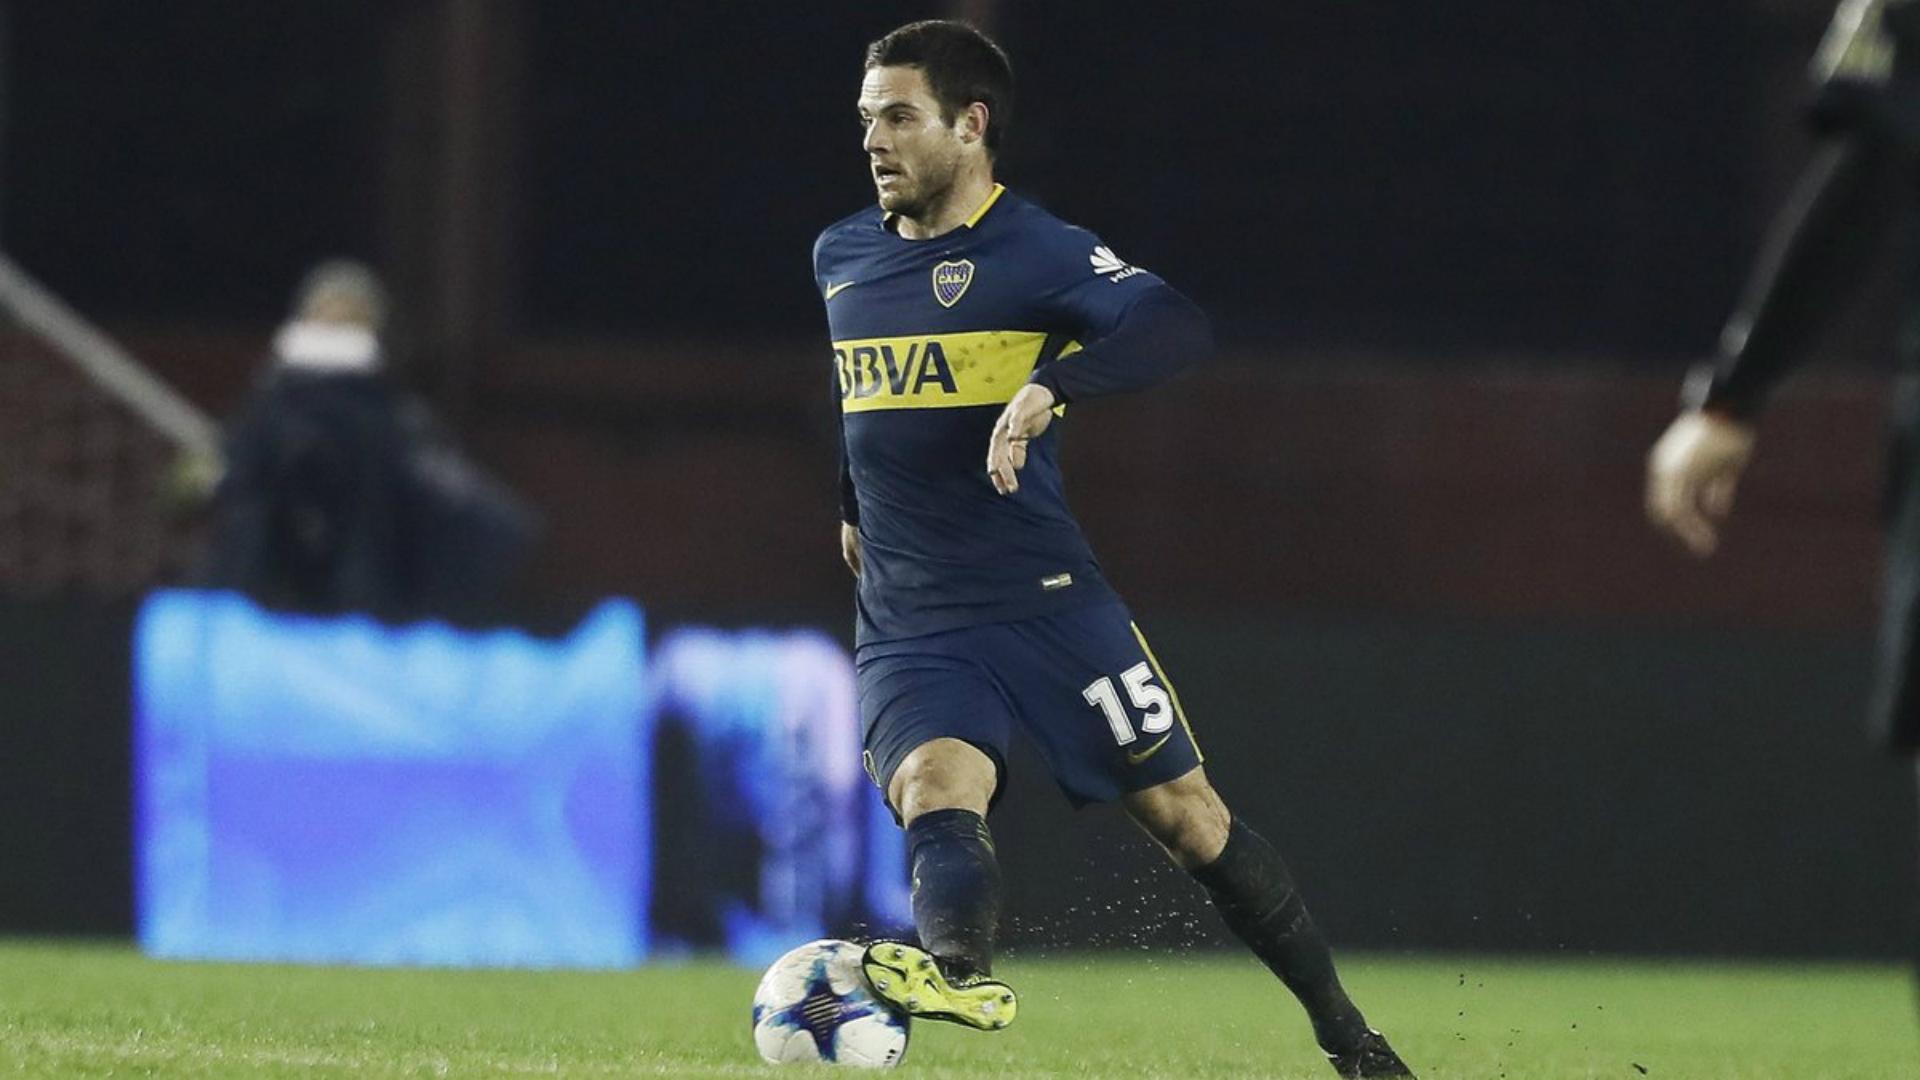 Nandez Lanus Boca Fecha 2 Superliga Argentina 10092017